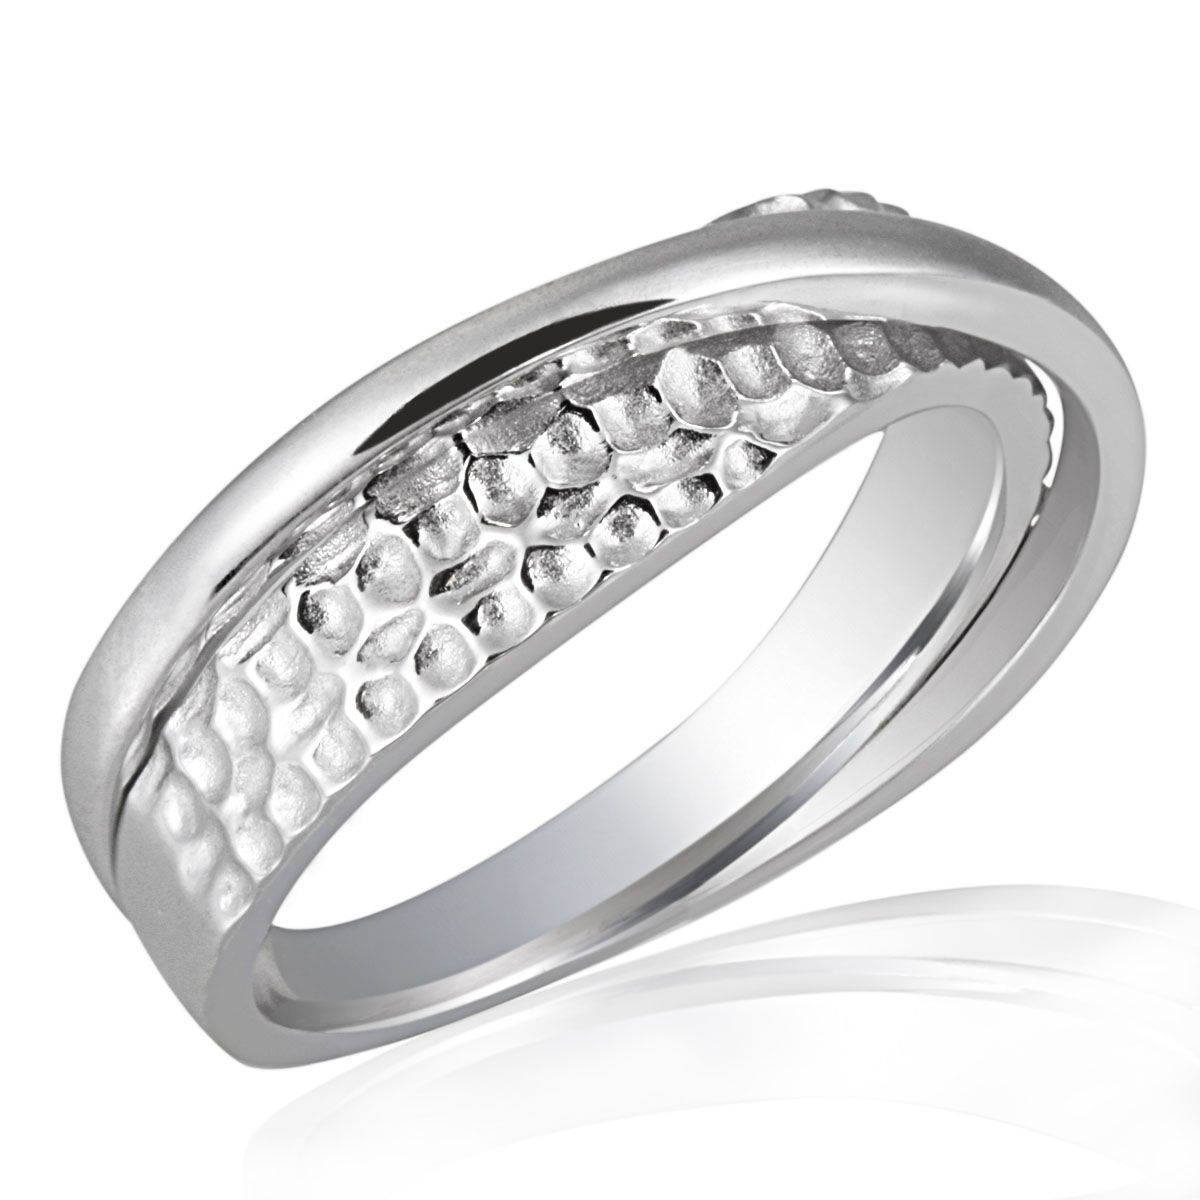 AVERDIN Averdin Damenring Silber 925 gehämmert tolles Design